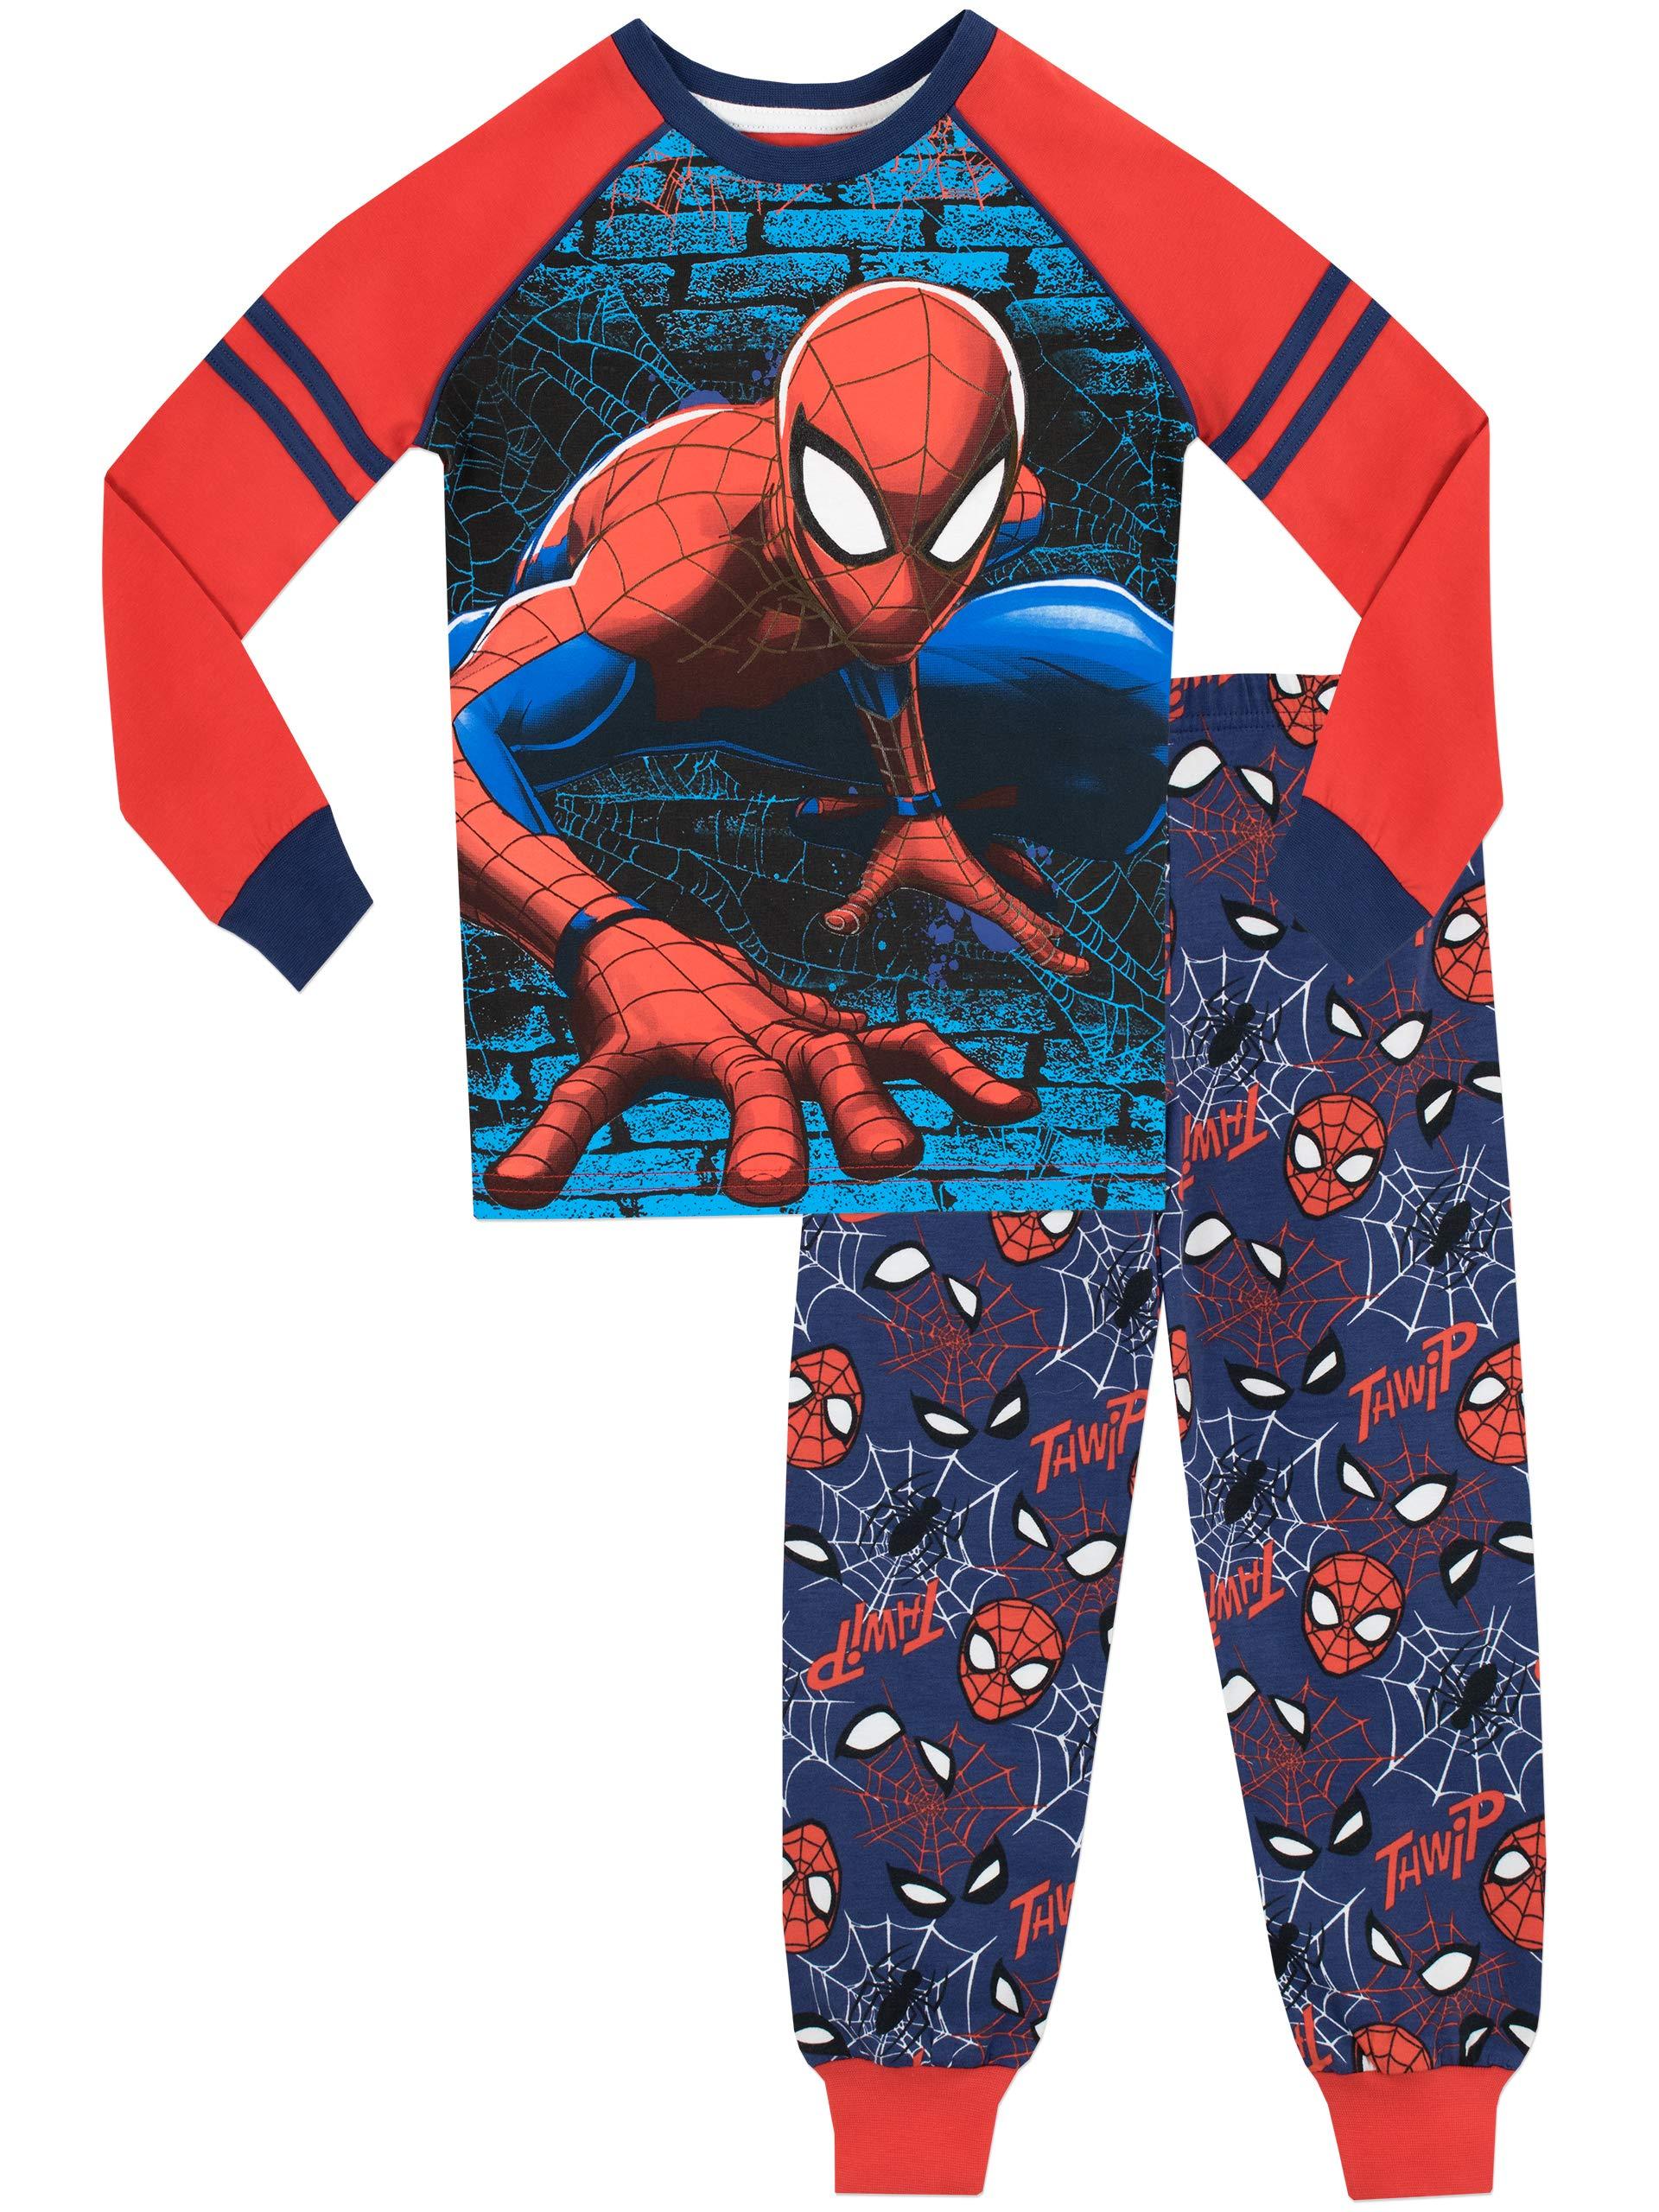 51d1843d95 Spiderman Boys Spiderman Slim Fit Pyjamas · Boys Marvel Avengers Iron Man  Captain America Thor Hulk Pyjamas